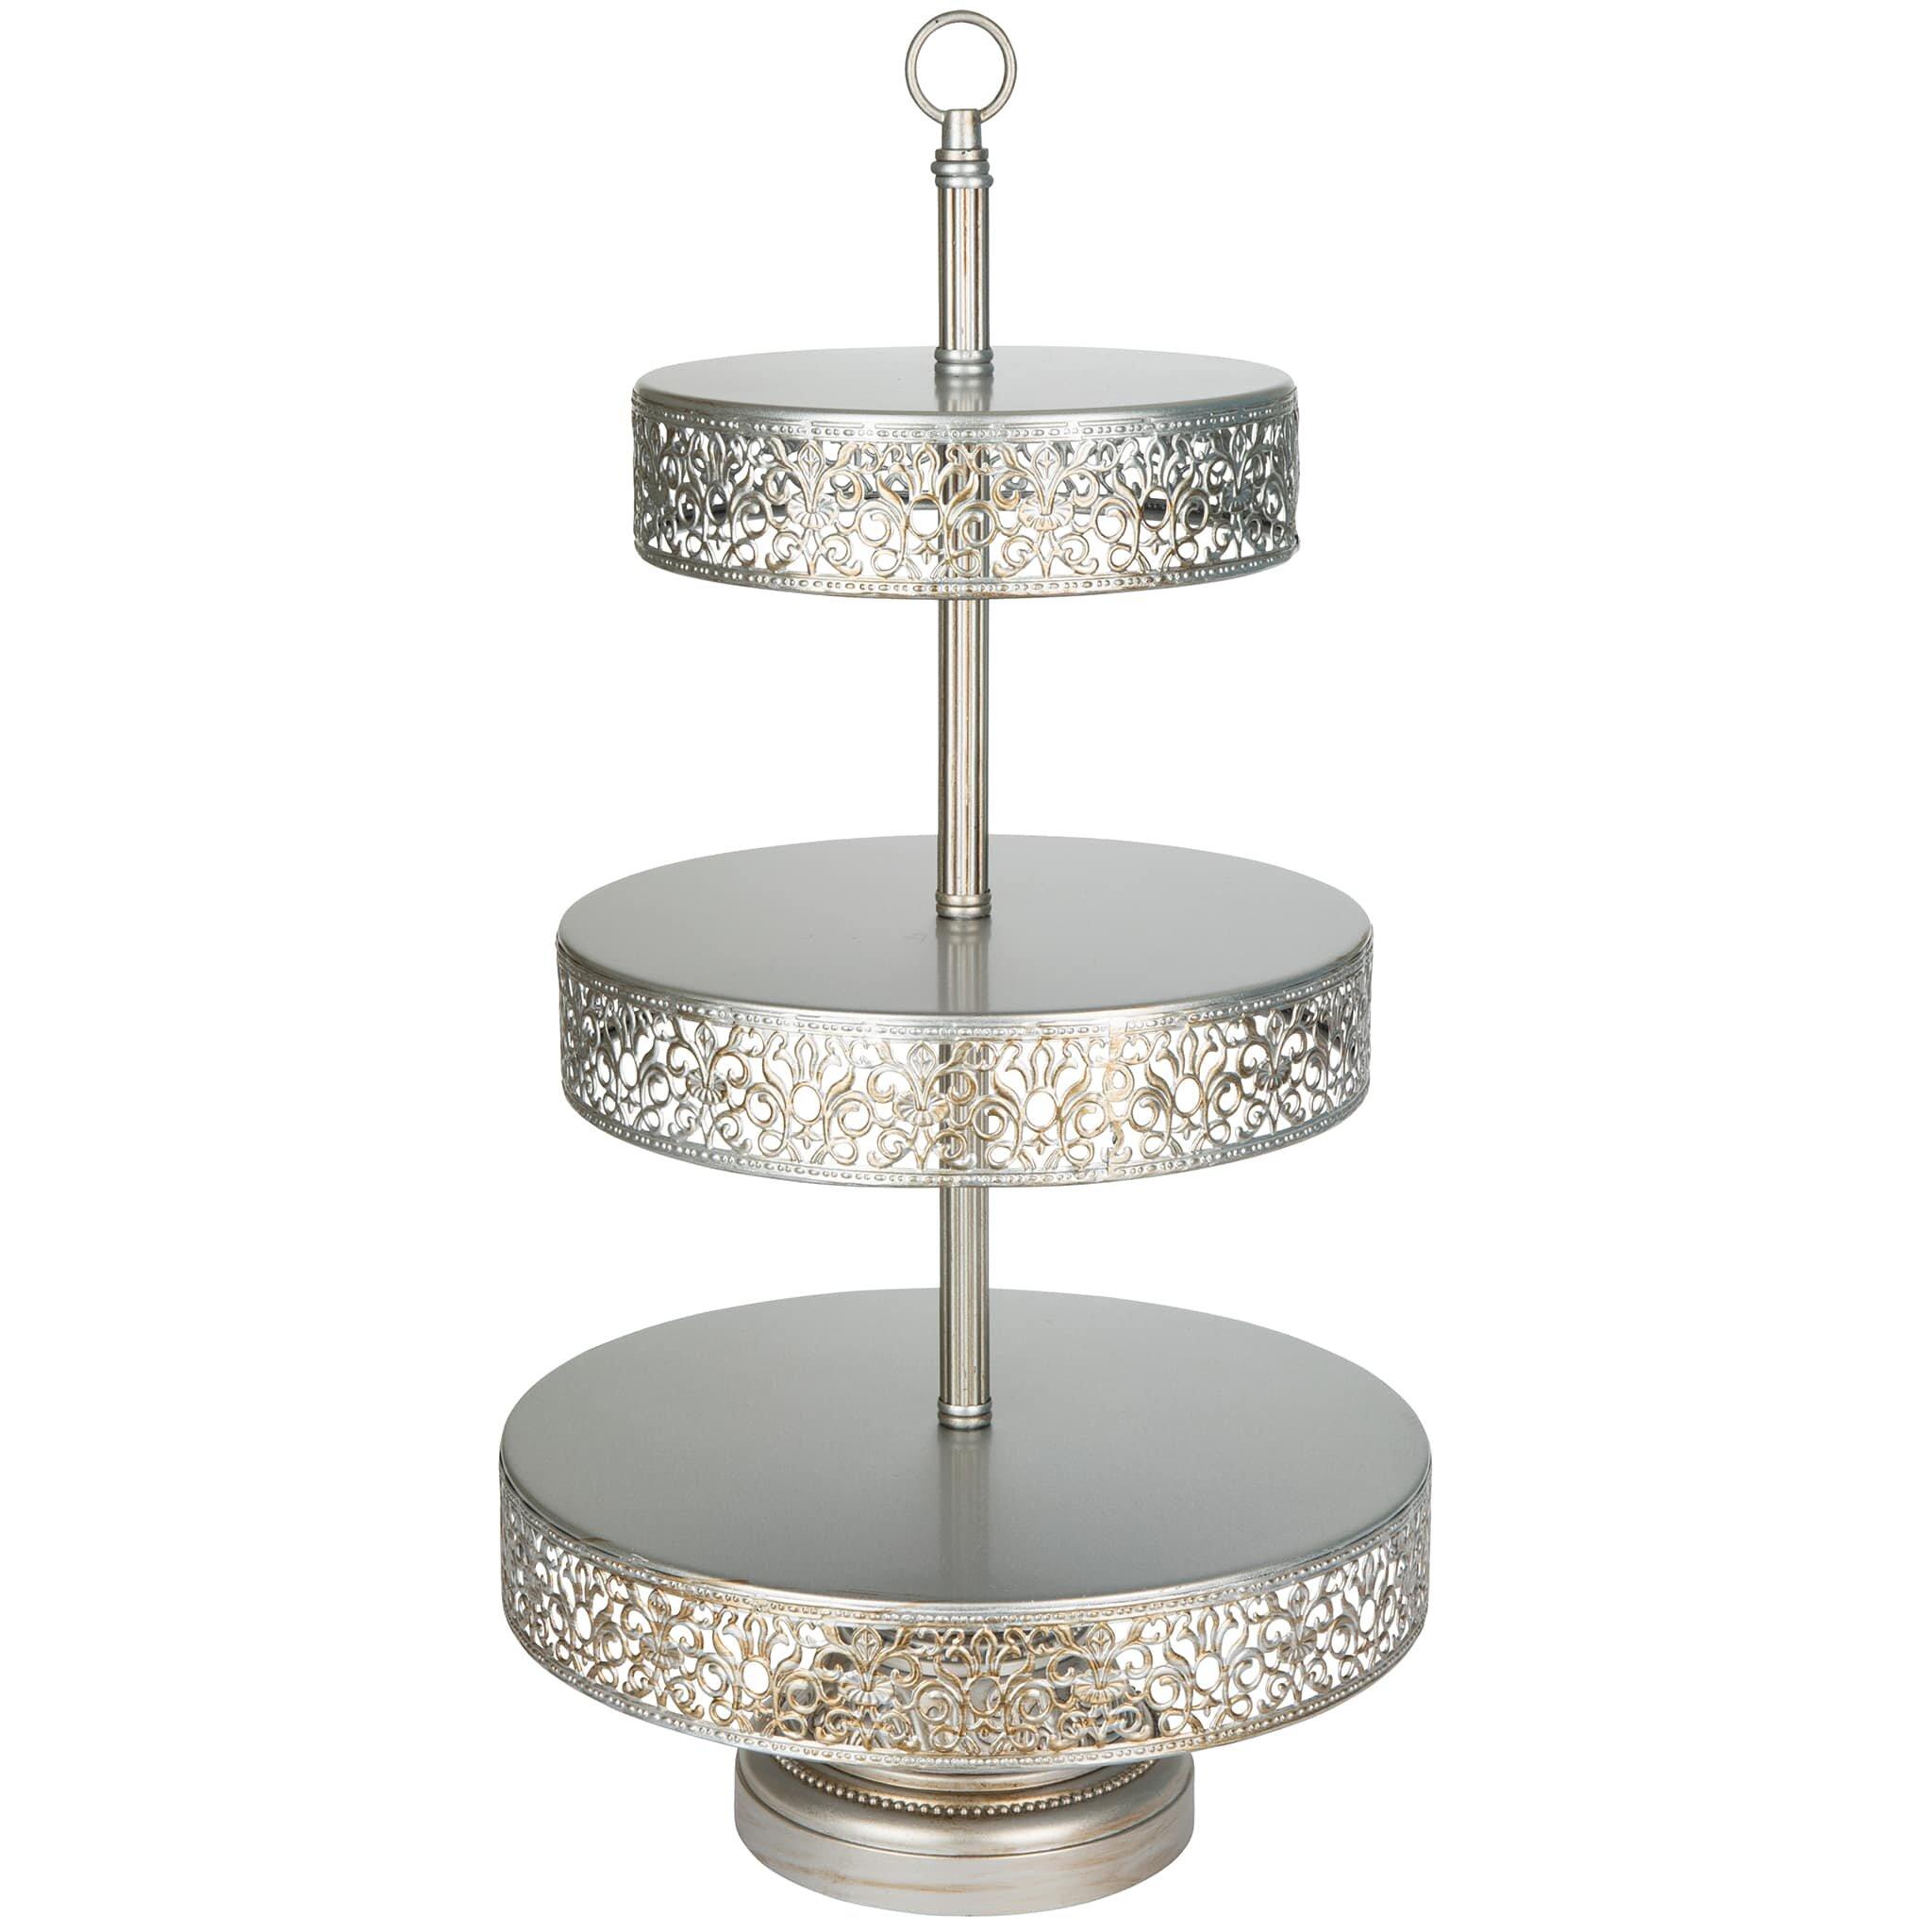 amalfidecor victoria 3 tier metal cupcake stand reviews. Black Bedroom Furniture Sets. Home Design Ideas